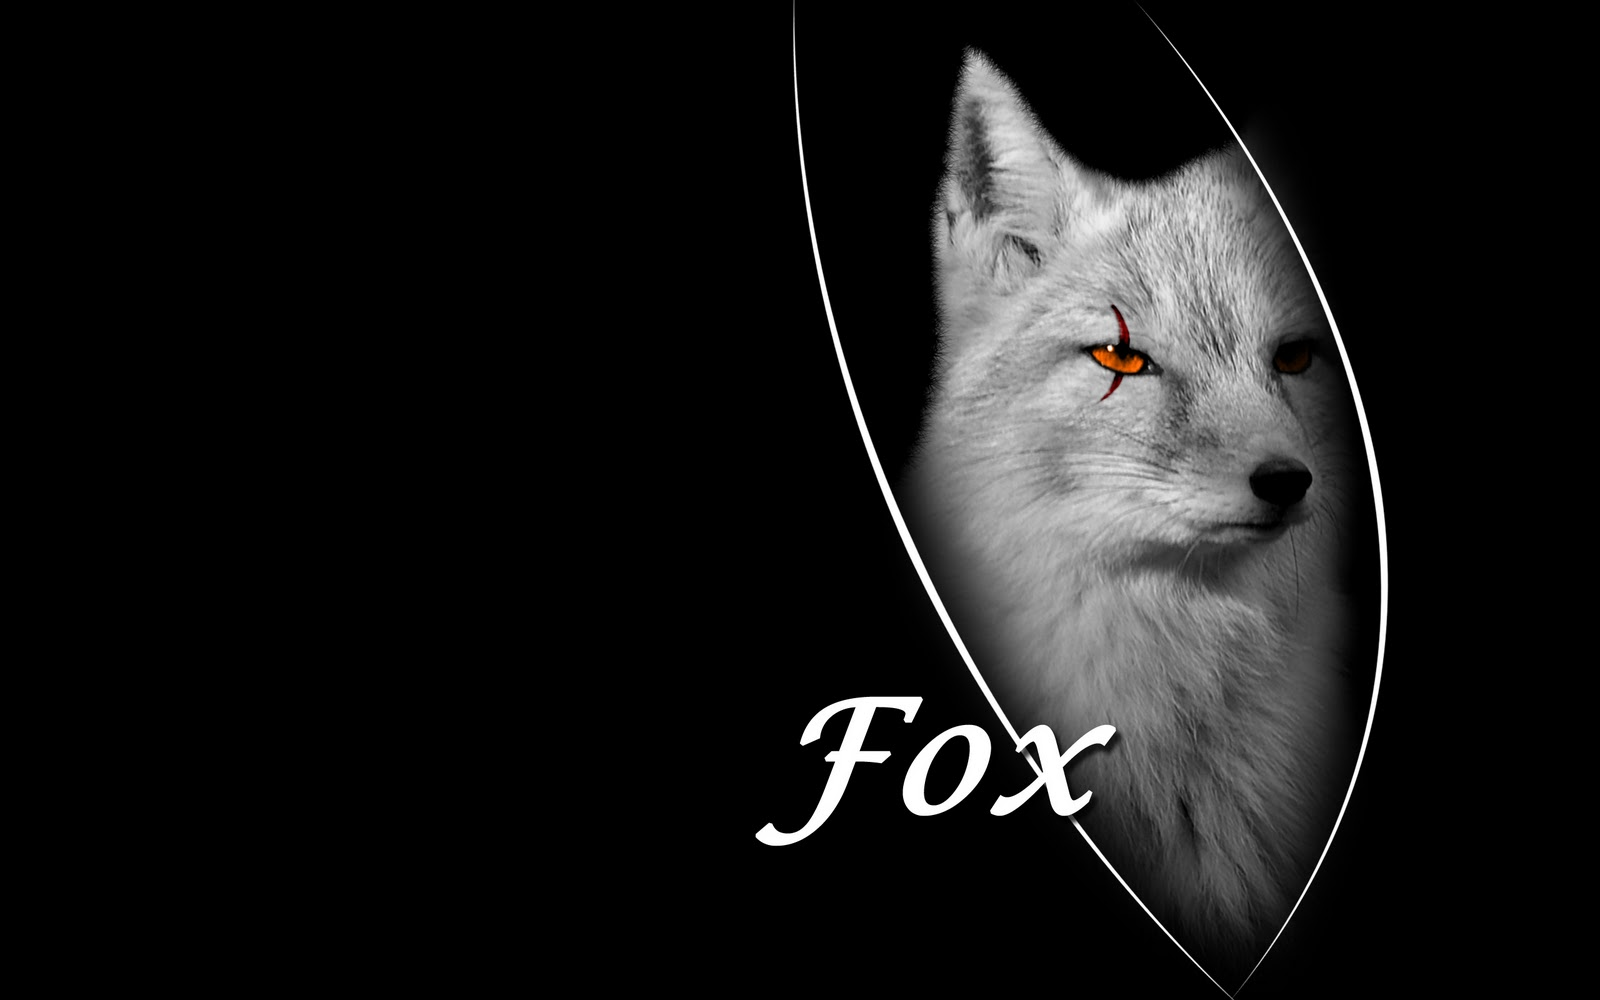 top desktop fox wallpapers hd fox wallpaper 24 black fox wallpaperjpg 1600x1000